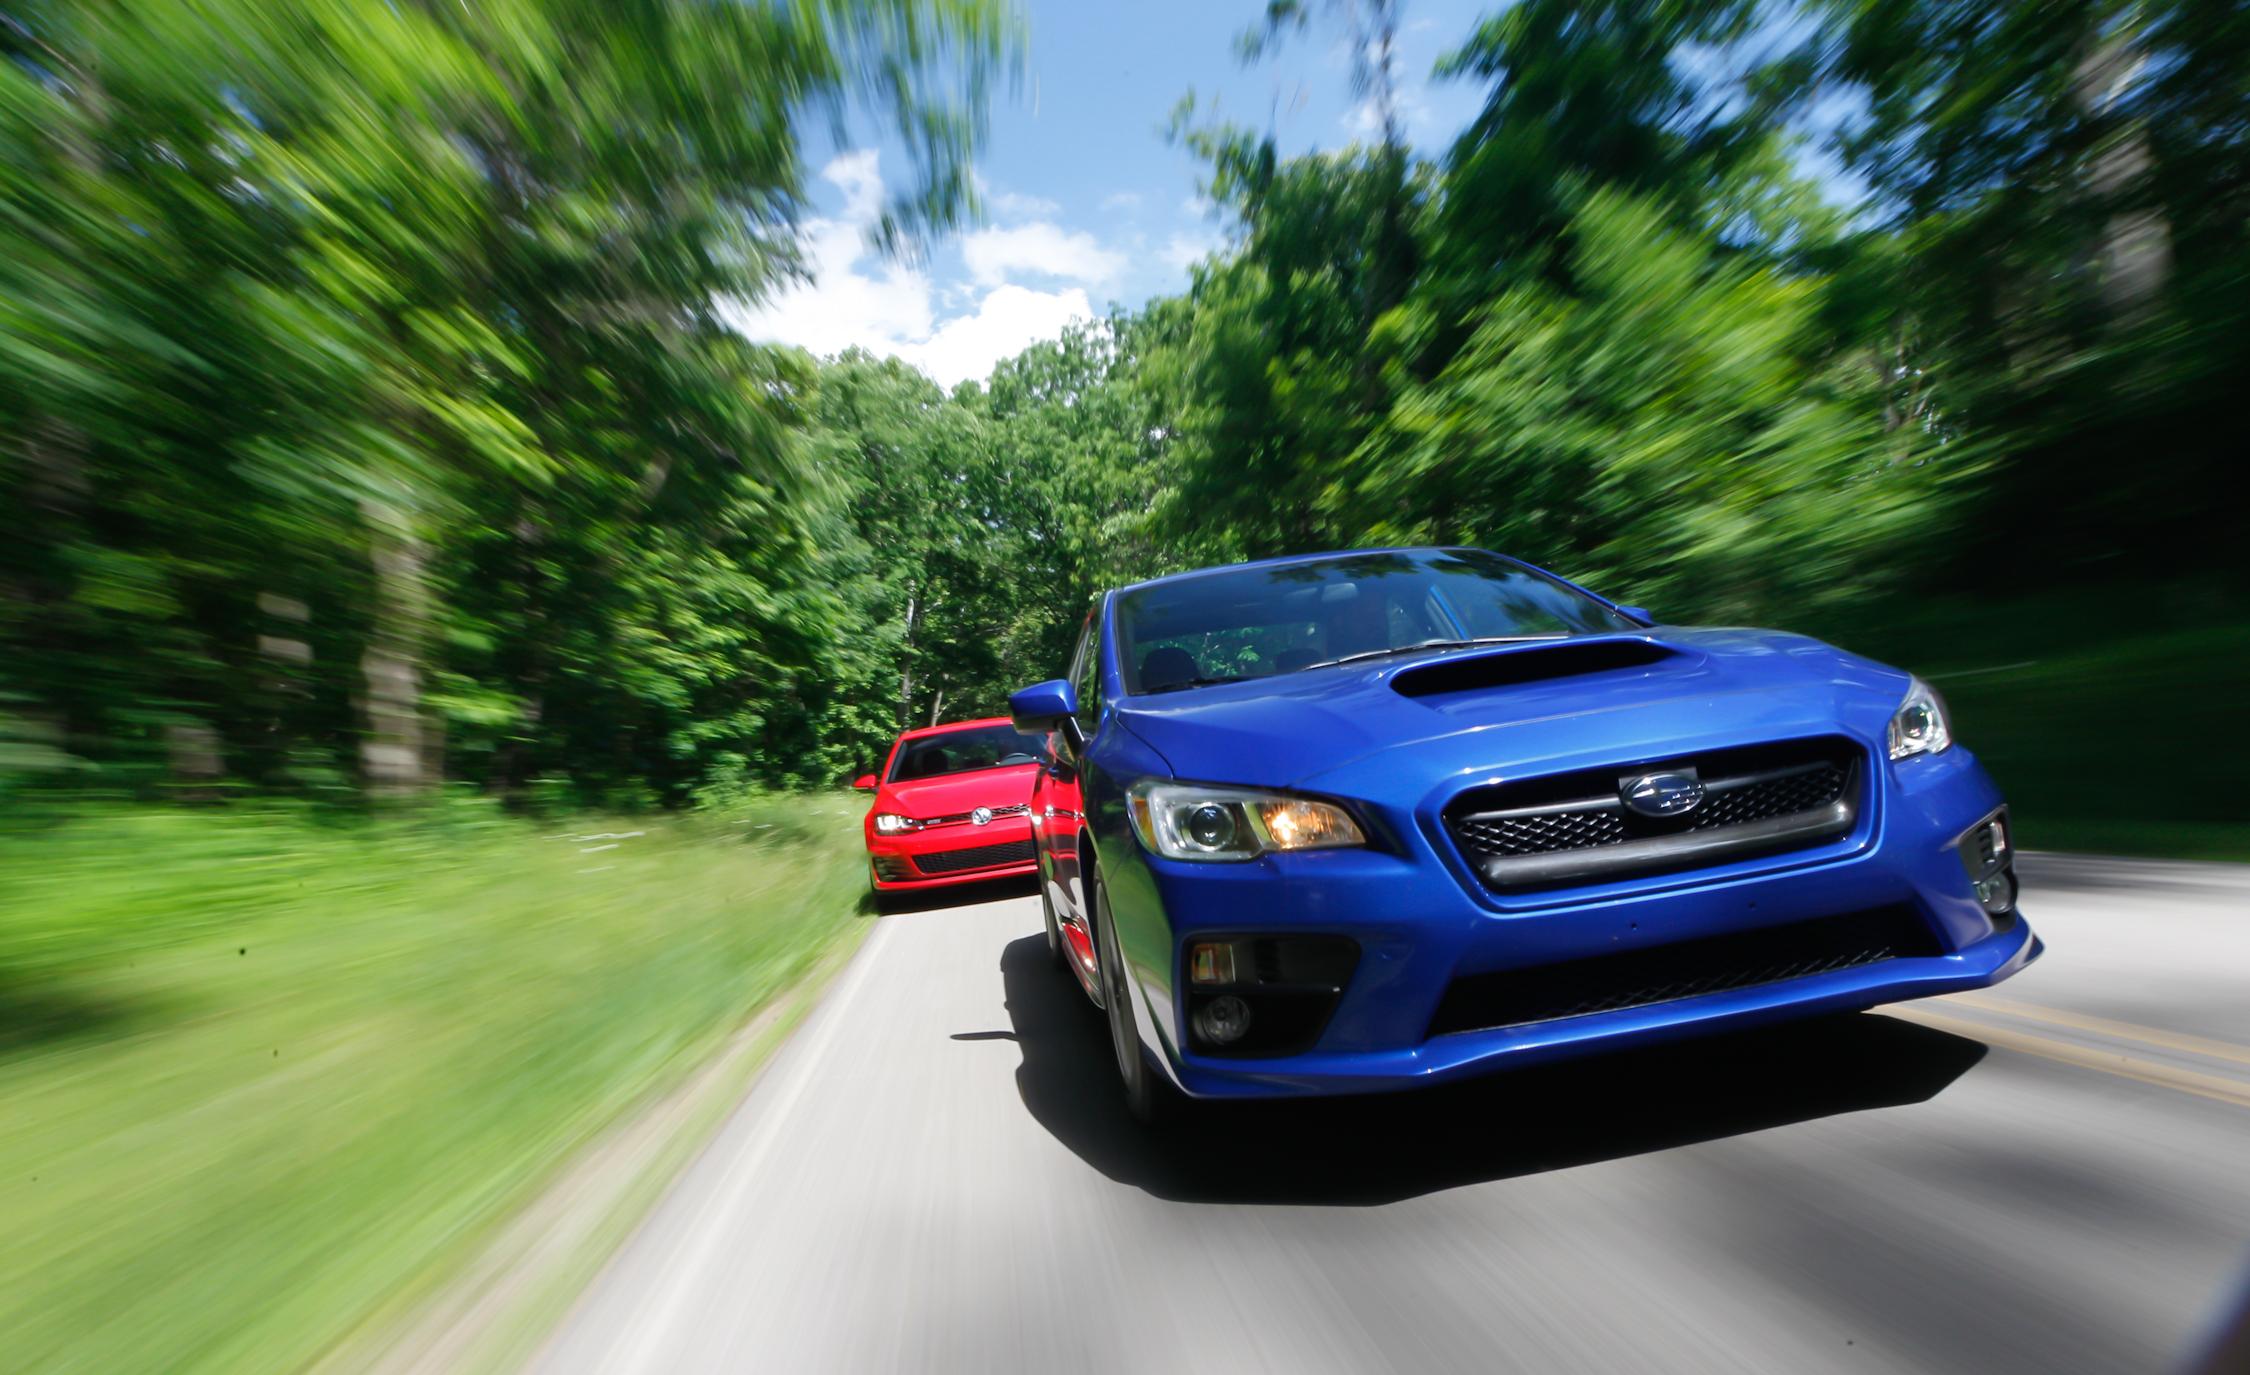 2015 Subaru WRX vs Volkswagen GTI Performance Test